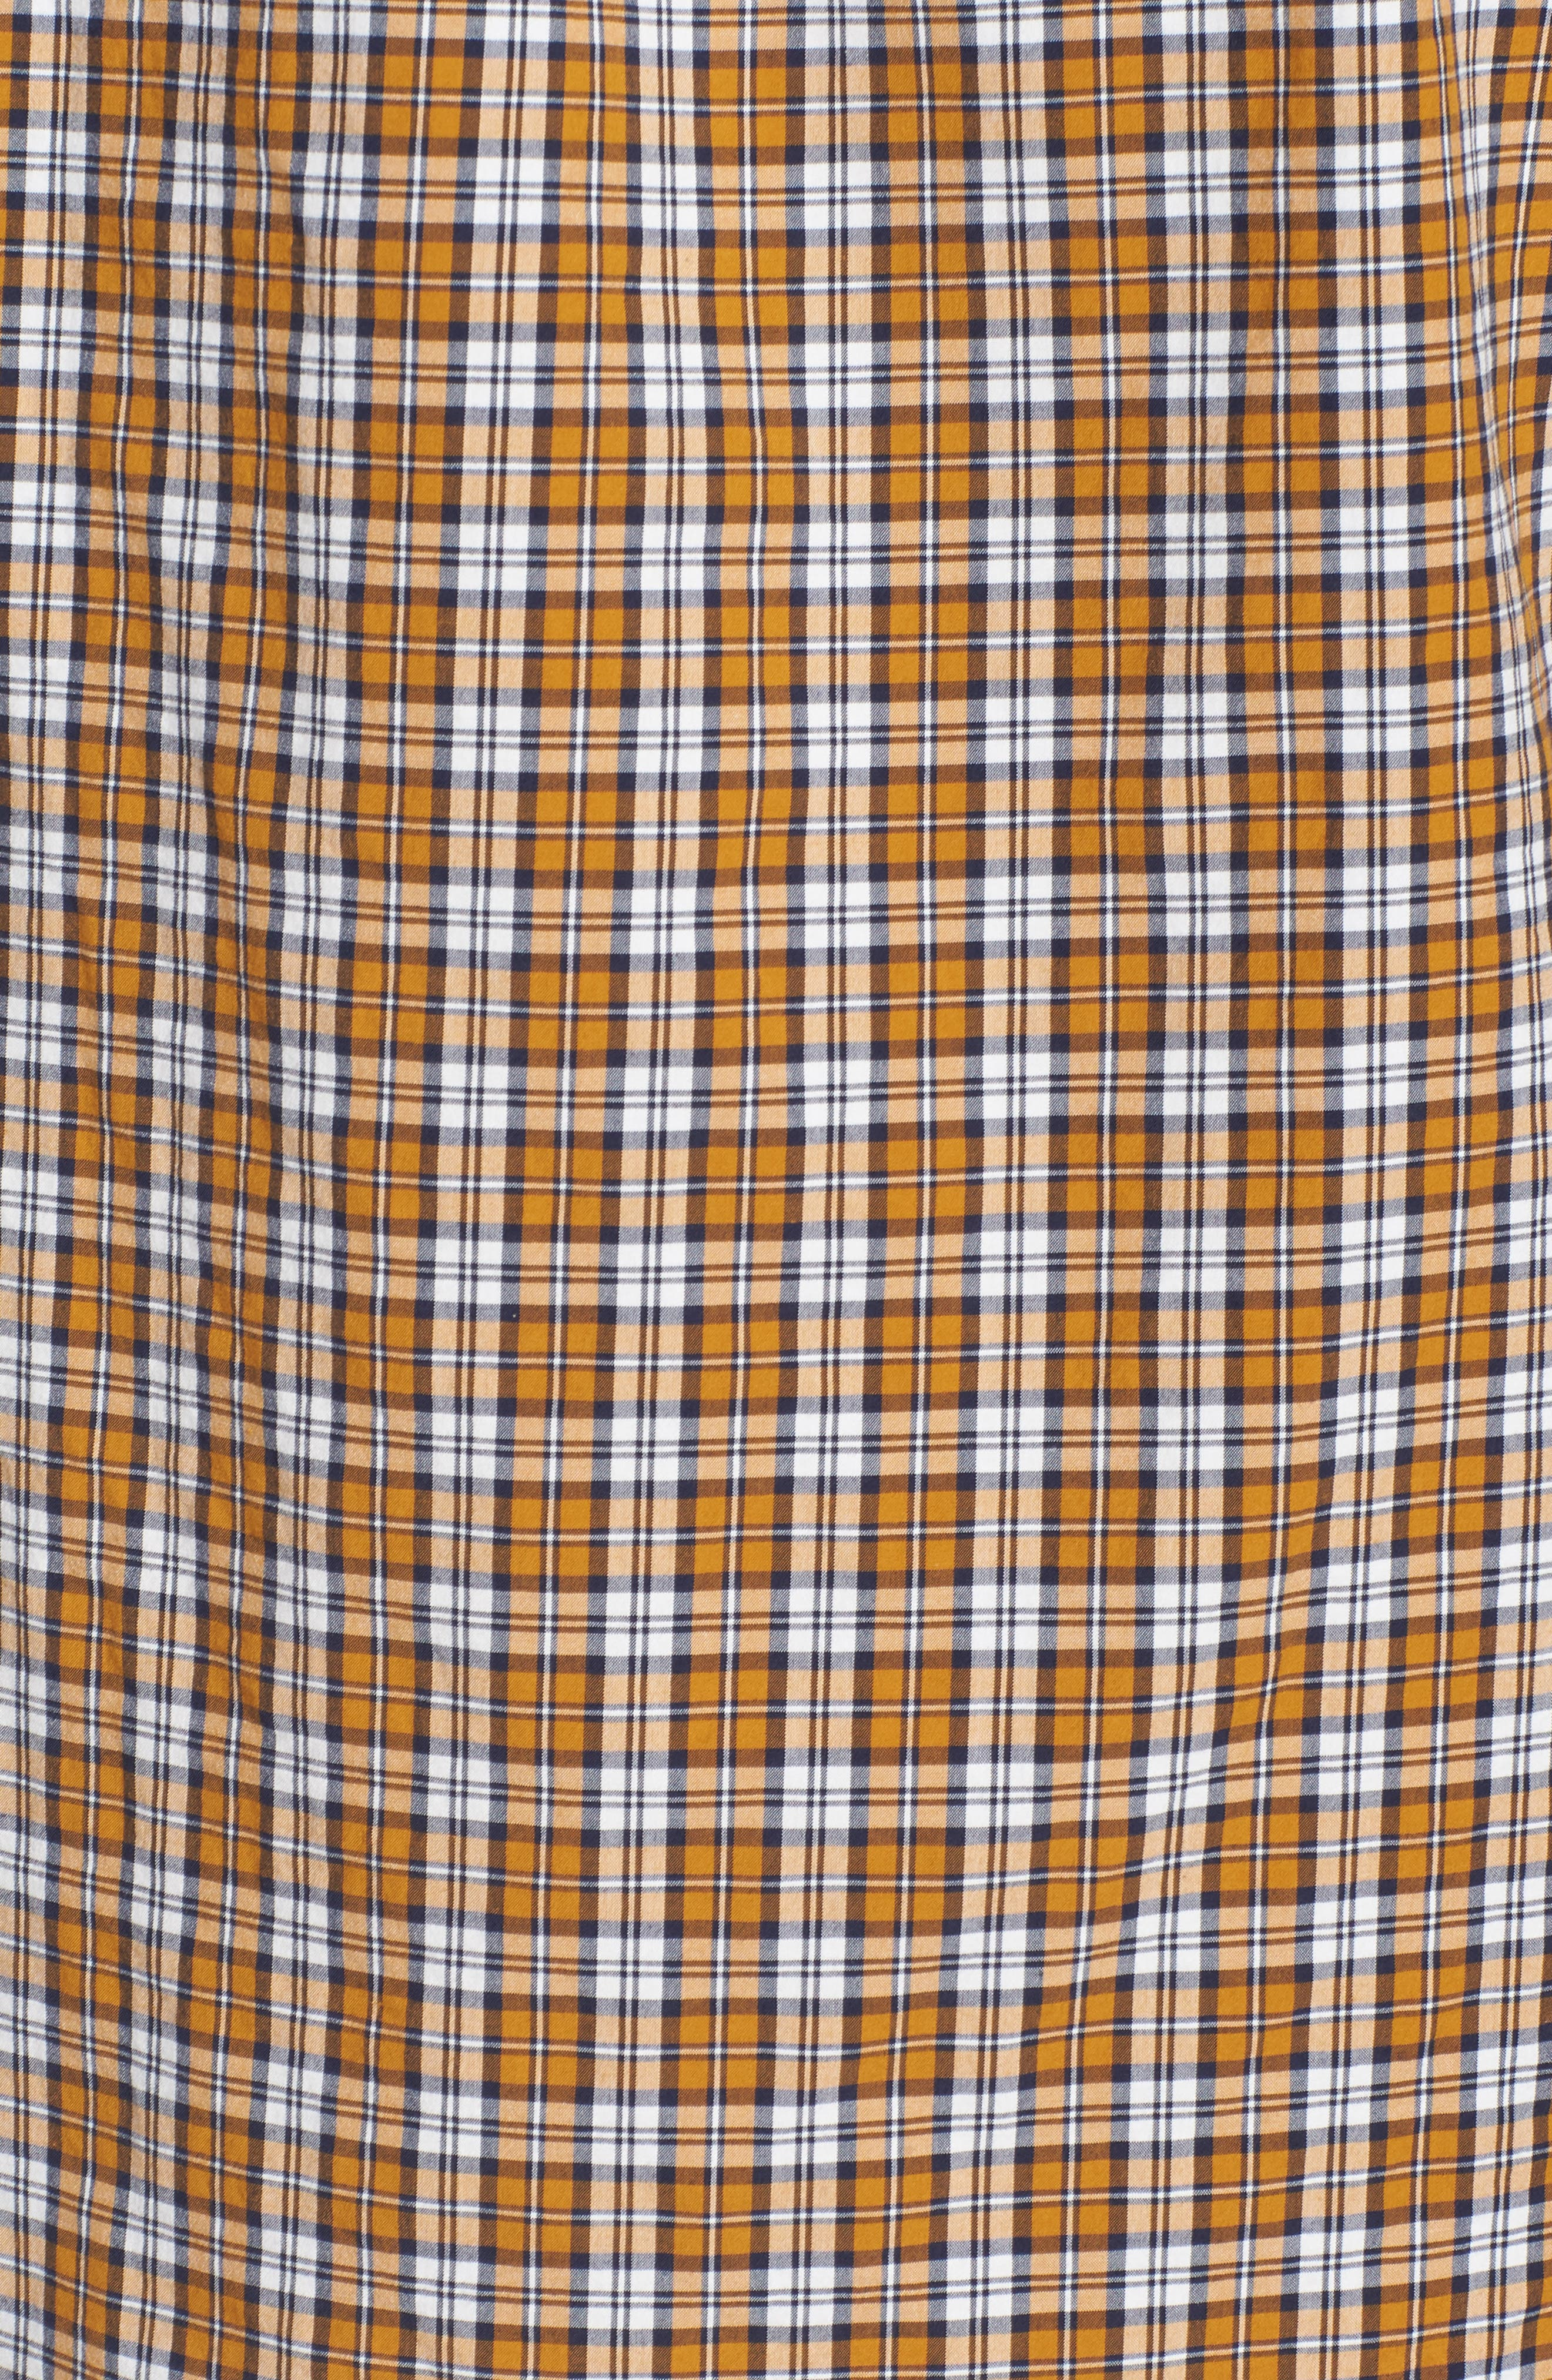 J.Crew Slim Fit Stretch Secret Wash Plaid Sport Shirt,                             Alternate thumbnail 5, color,                             Warm Cider